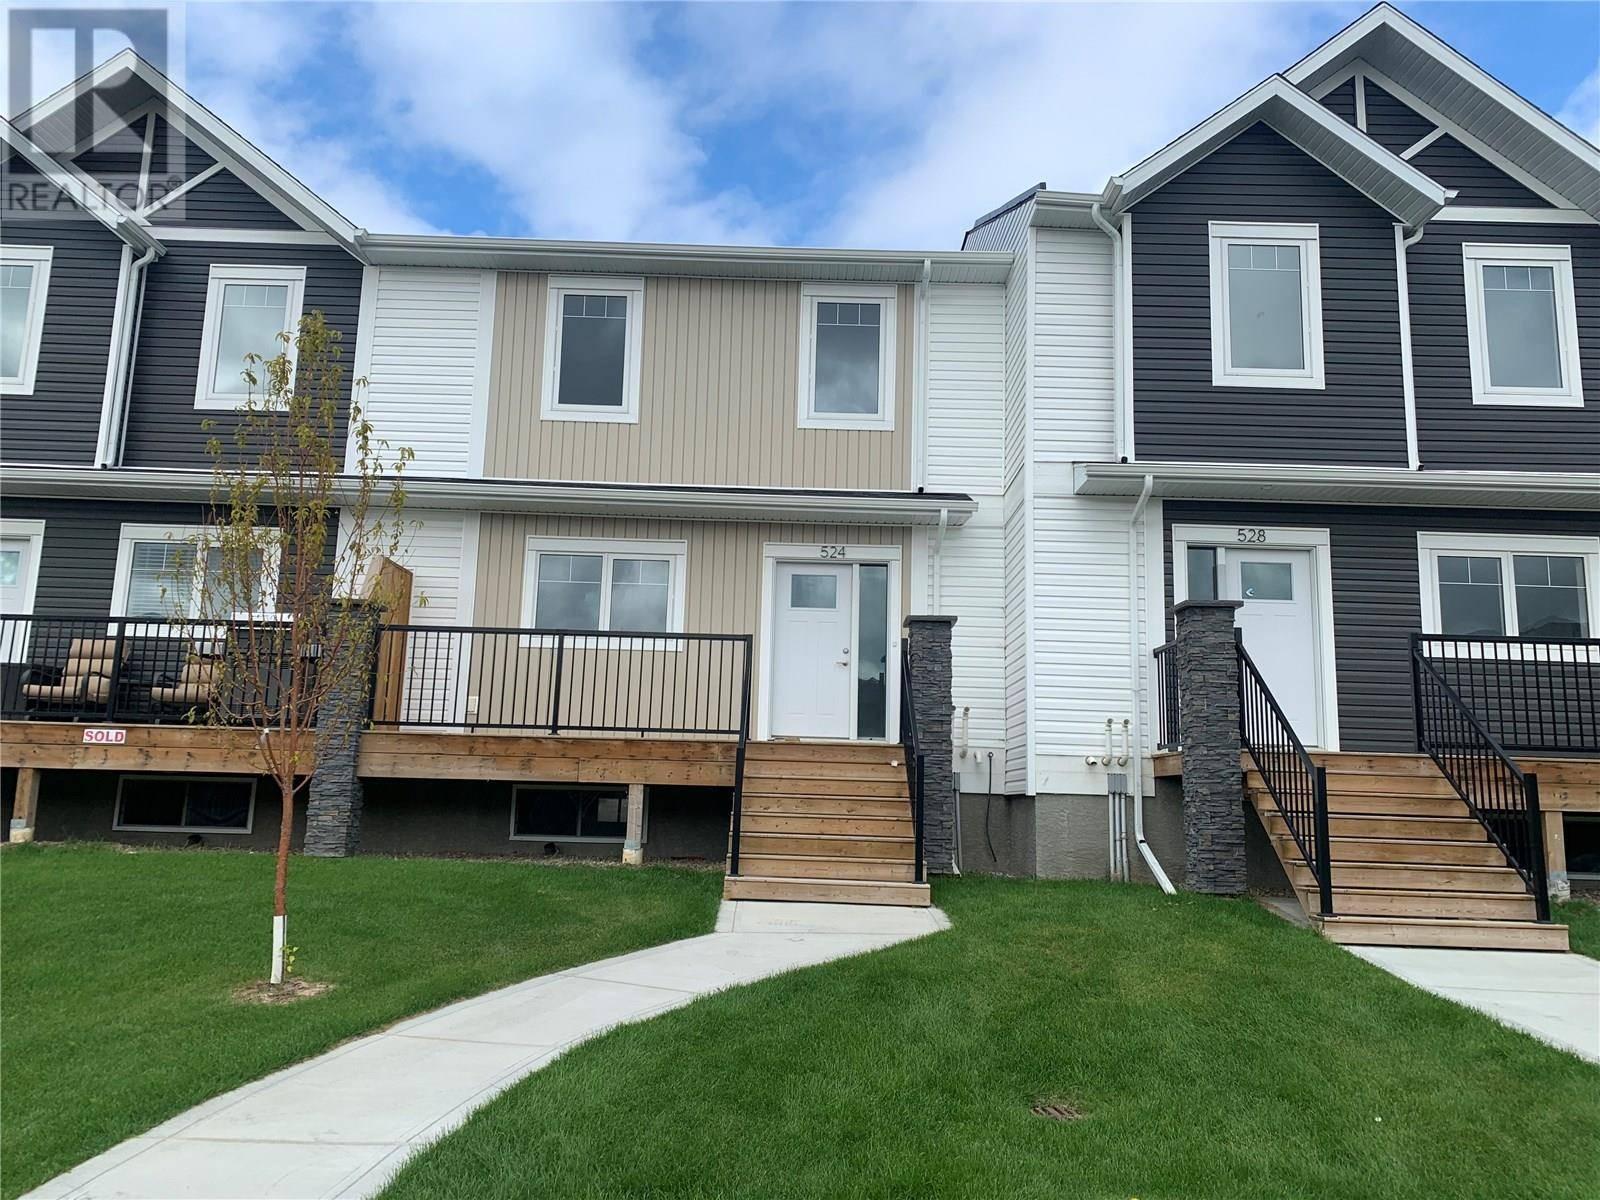 Townhouse for sale at 524 Kloppenburg Cres Saskatoon Saskatchewan - MLS: SK786110